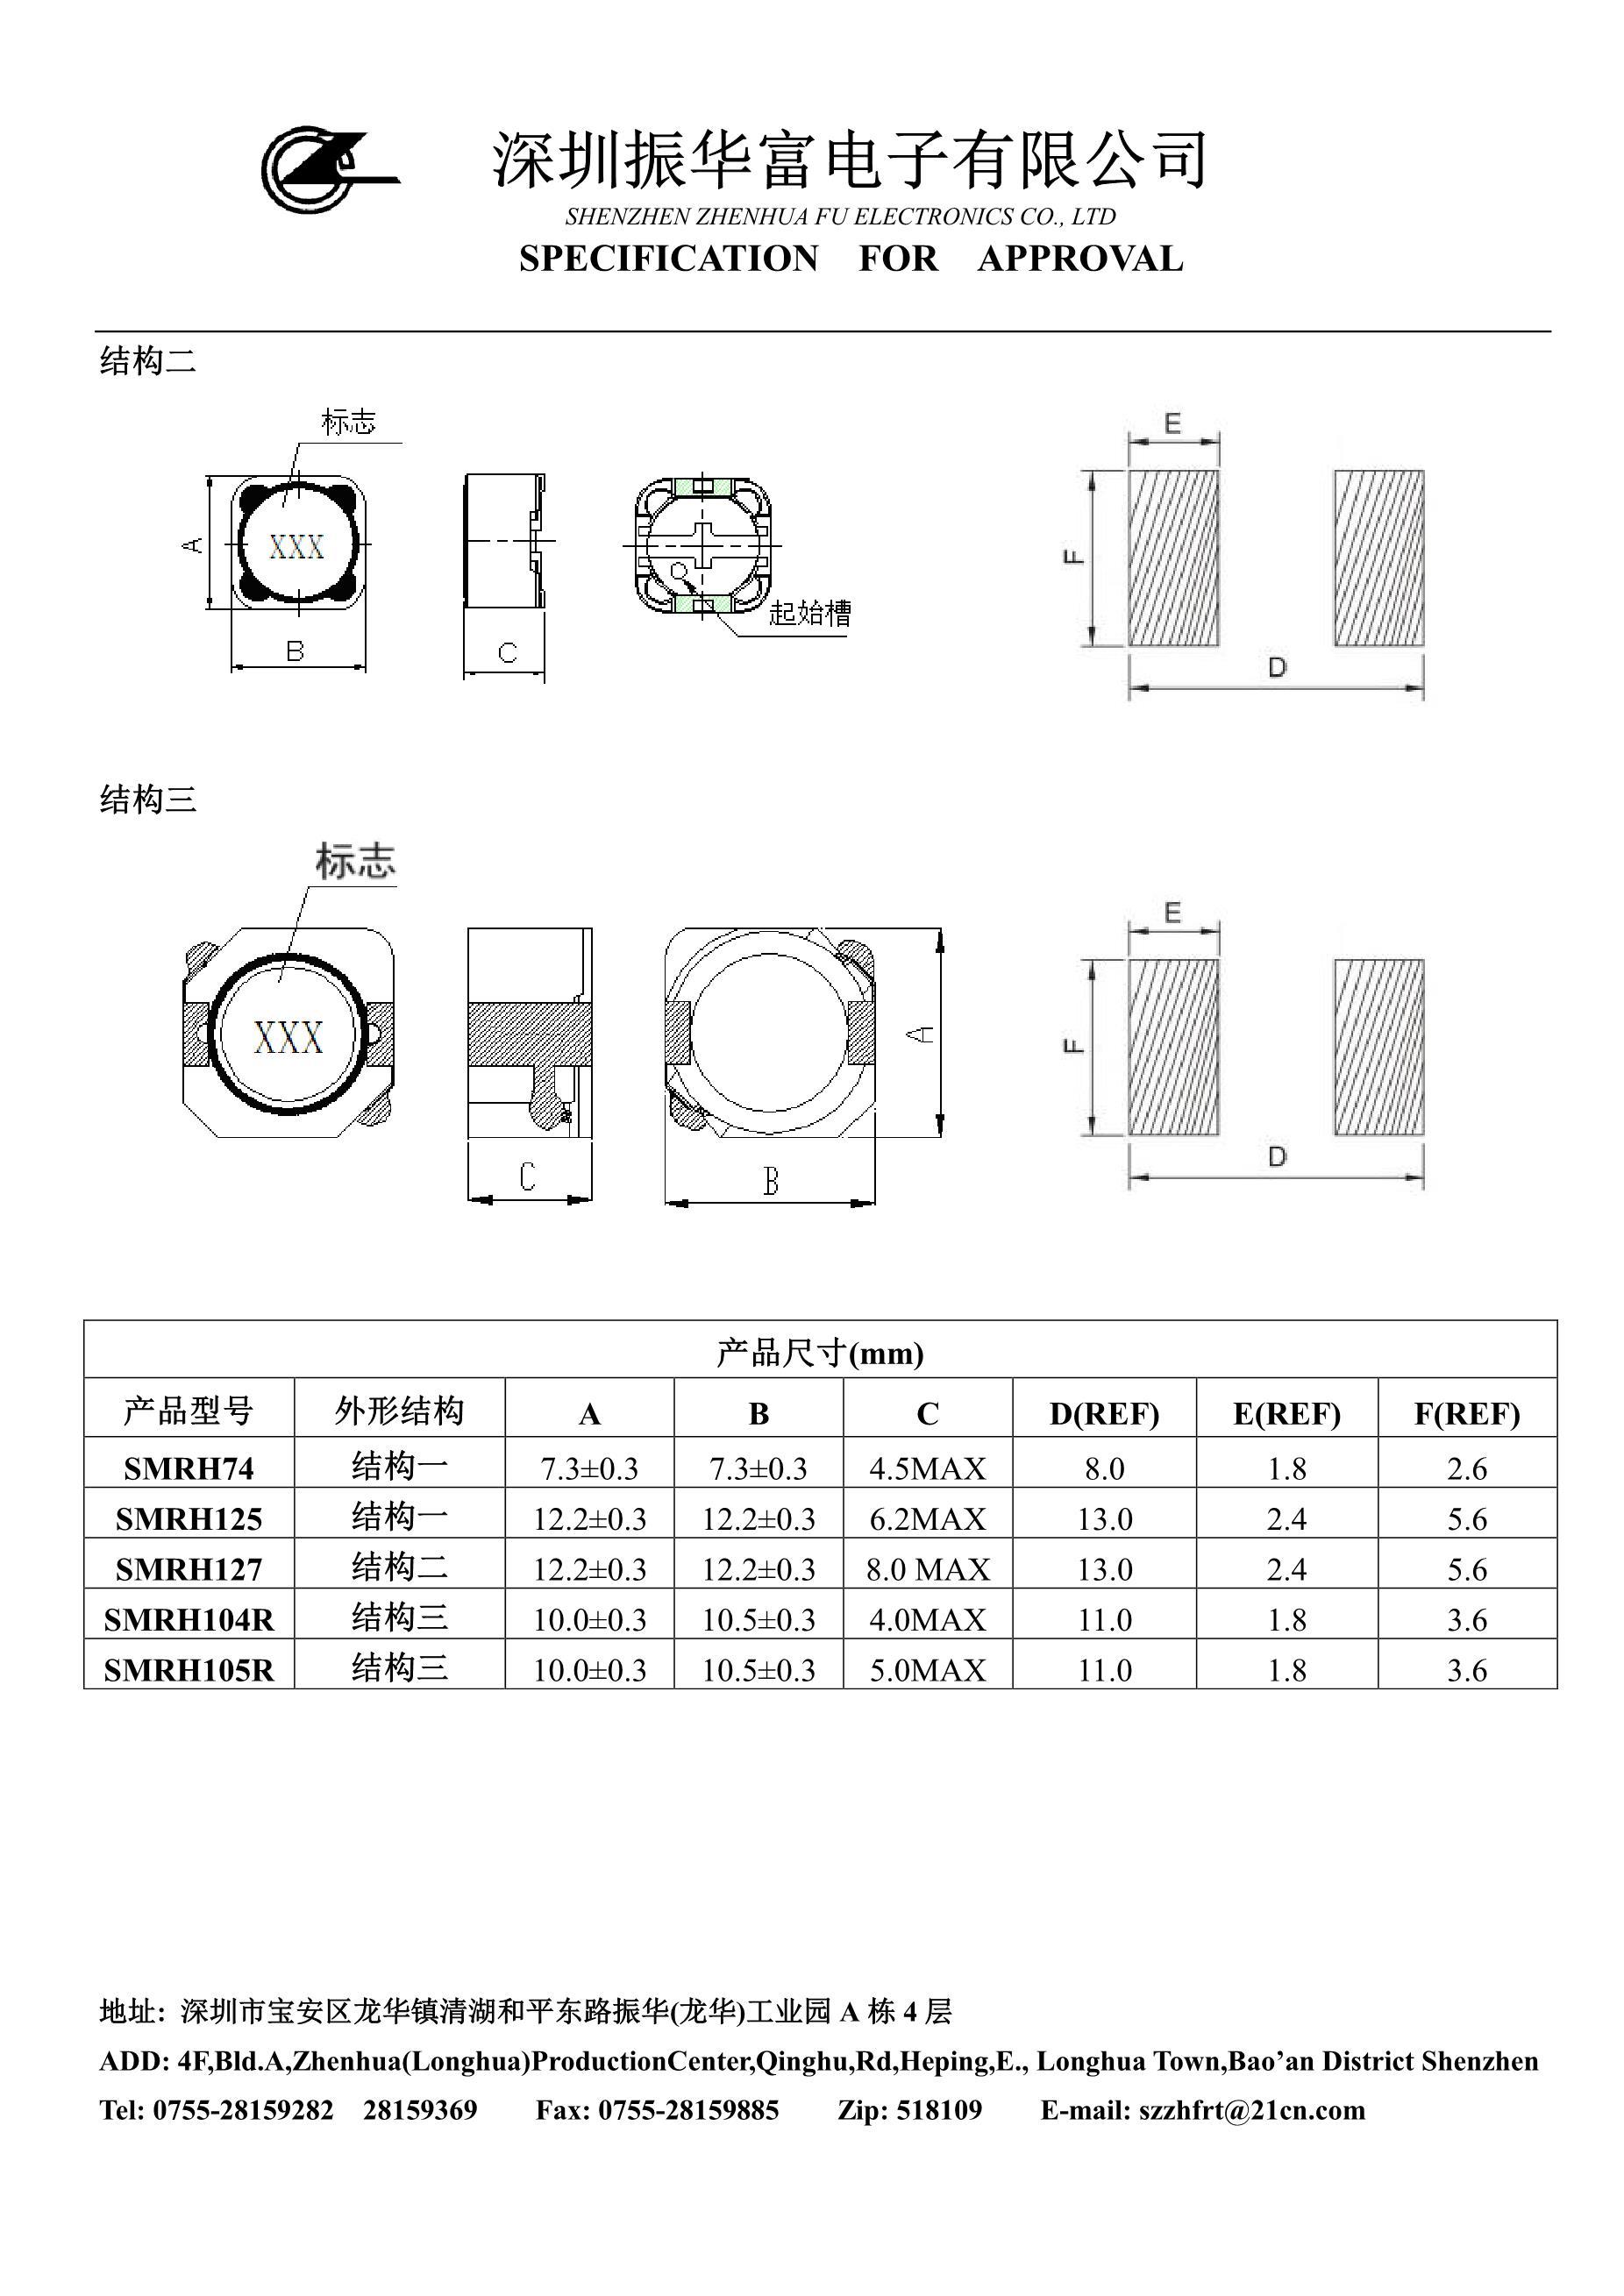 100N03LT's pdf picture 2